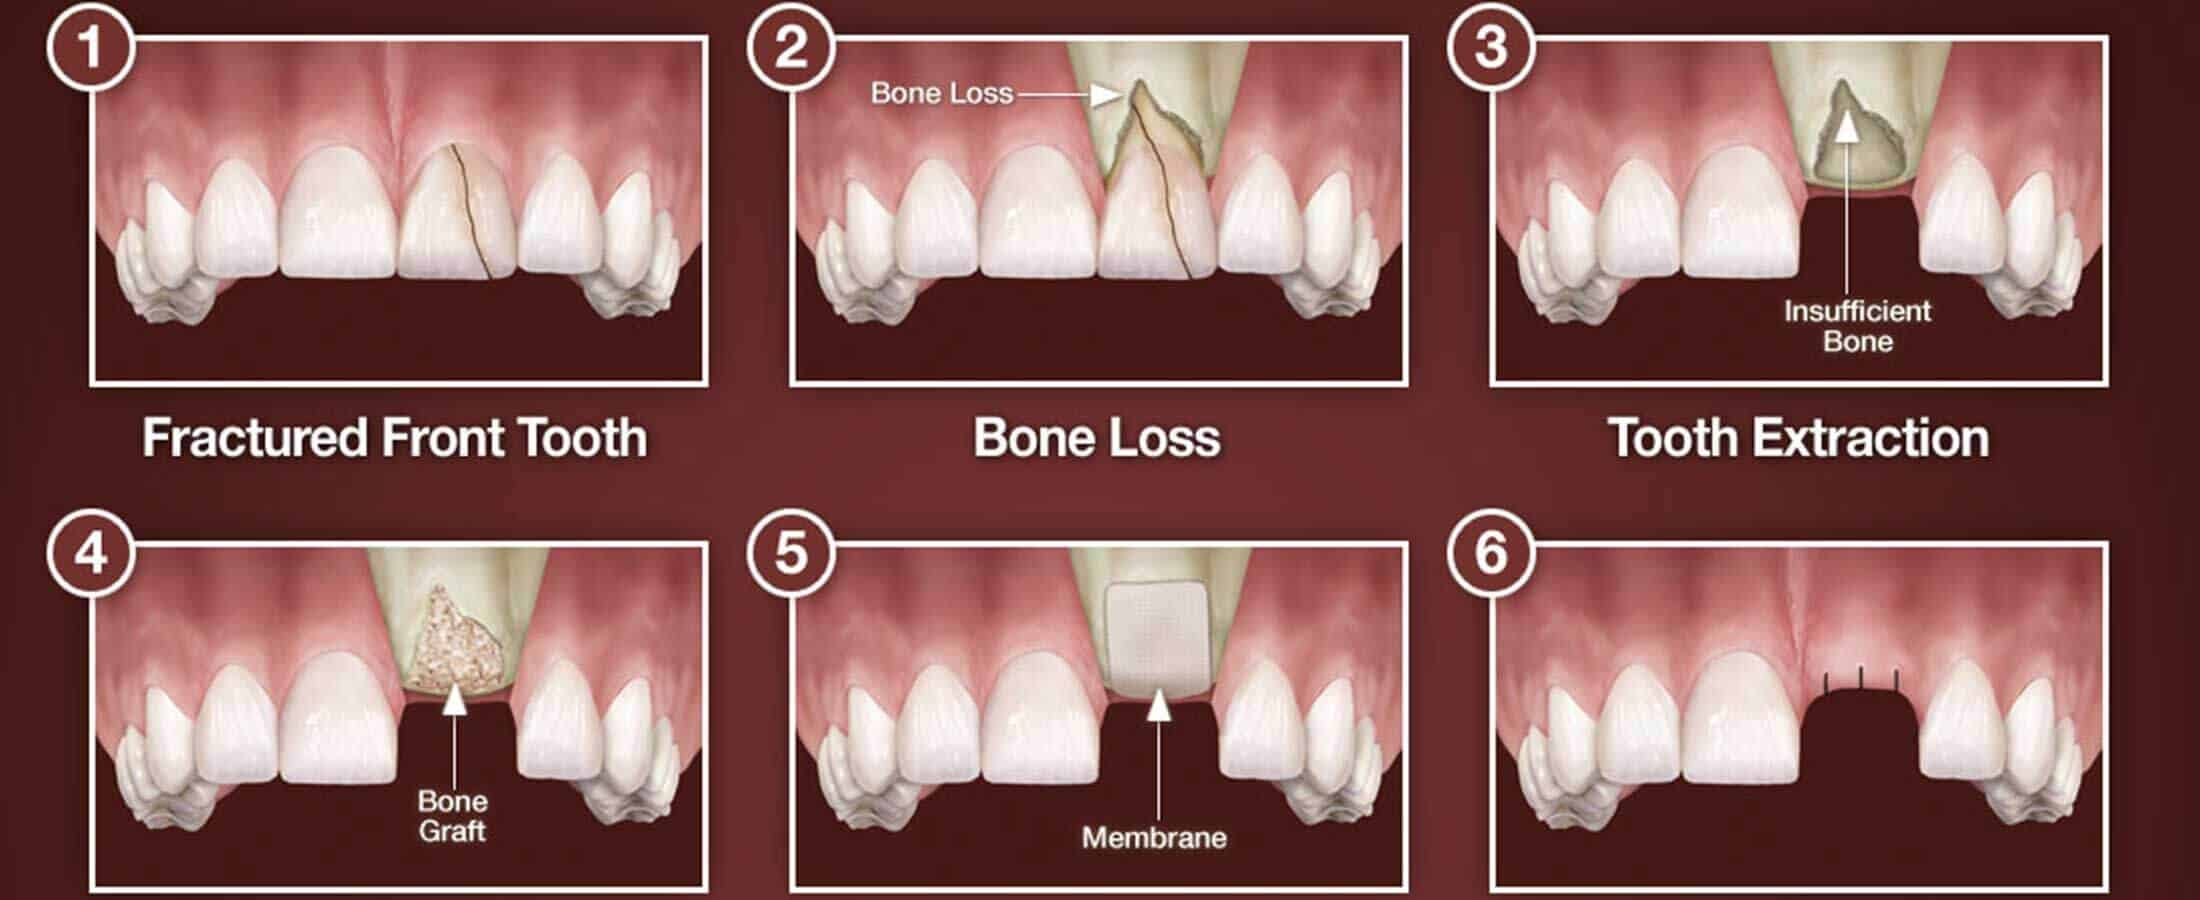 3 Myths About Dental Bone Grafting Implantation Dental Center Blog